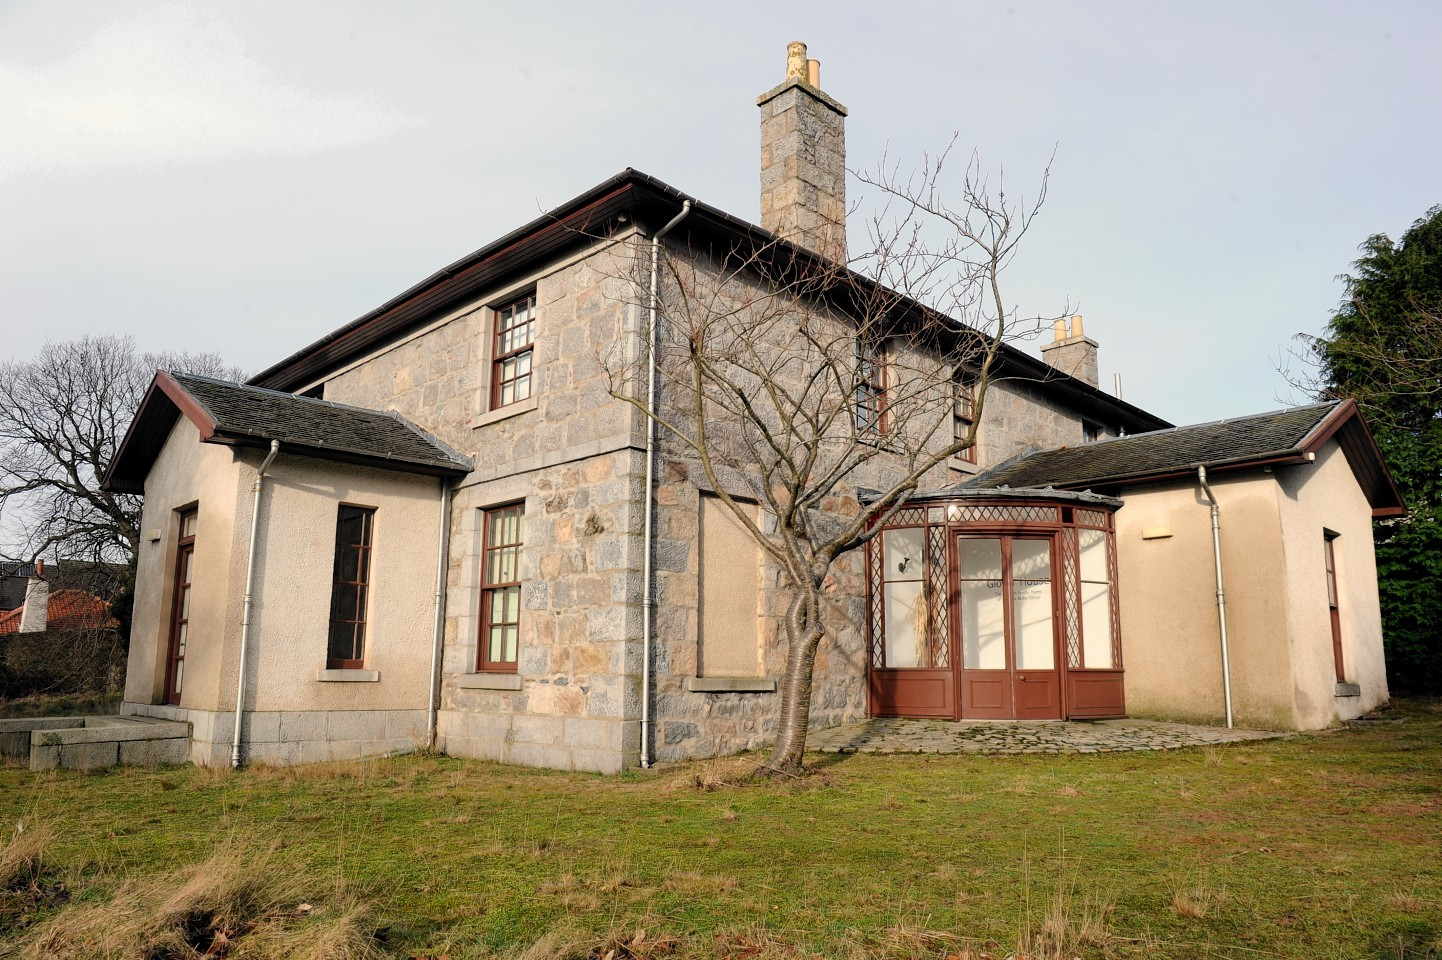 Thomas Blake Glover house at Bridge of Don